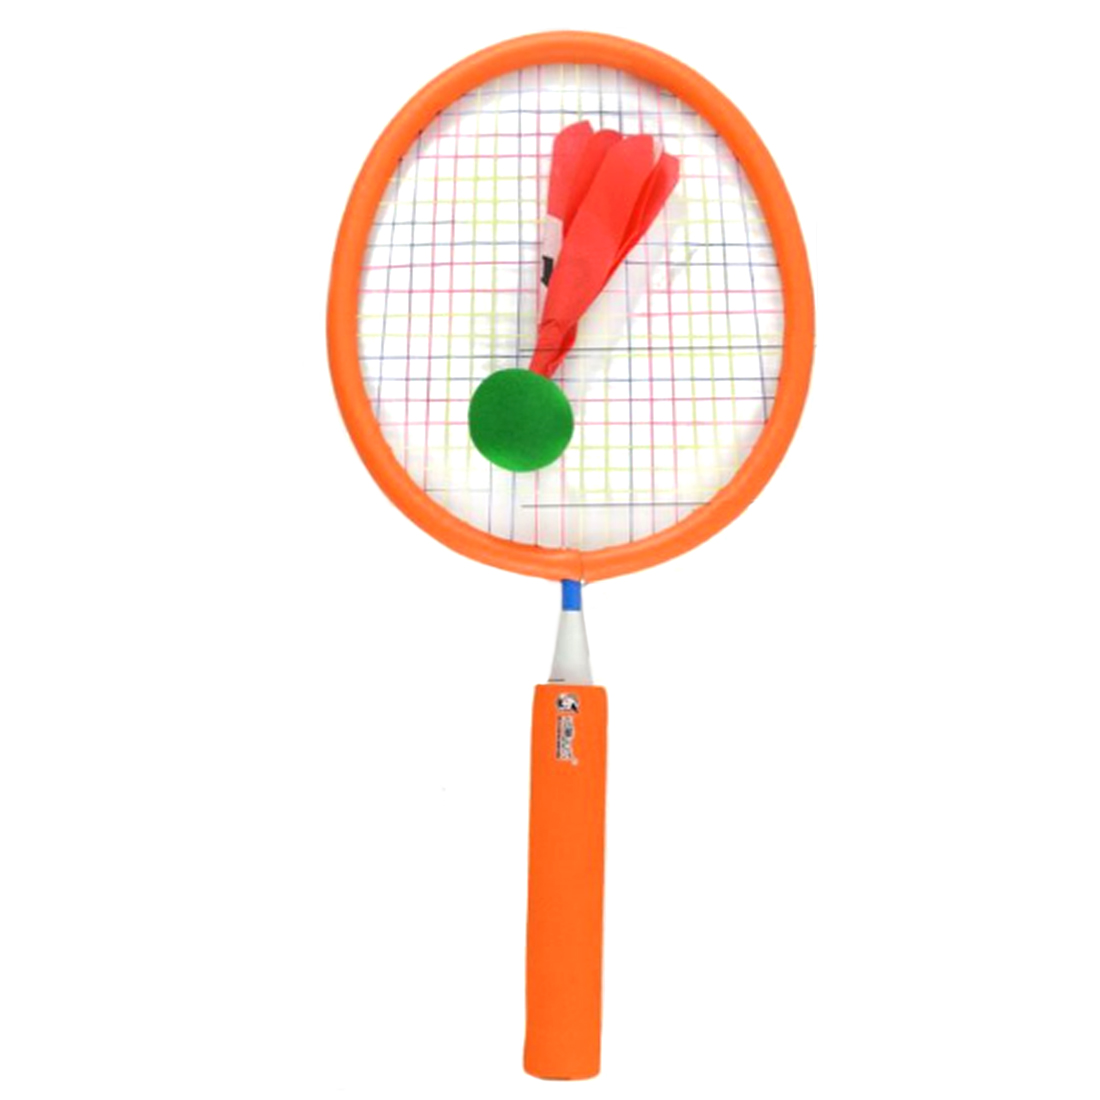 Cycle Zone Children Badminton Racket Safety Sports Training Tool Toys Set - Orange